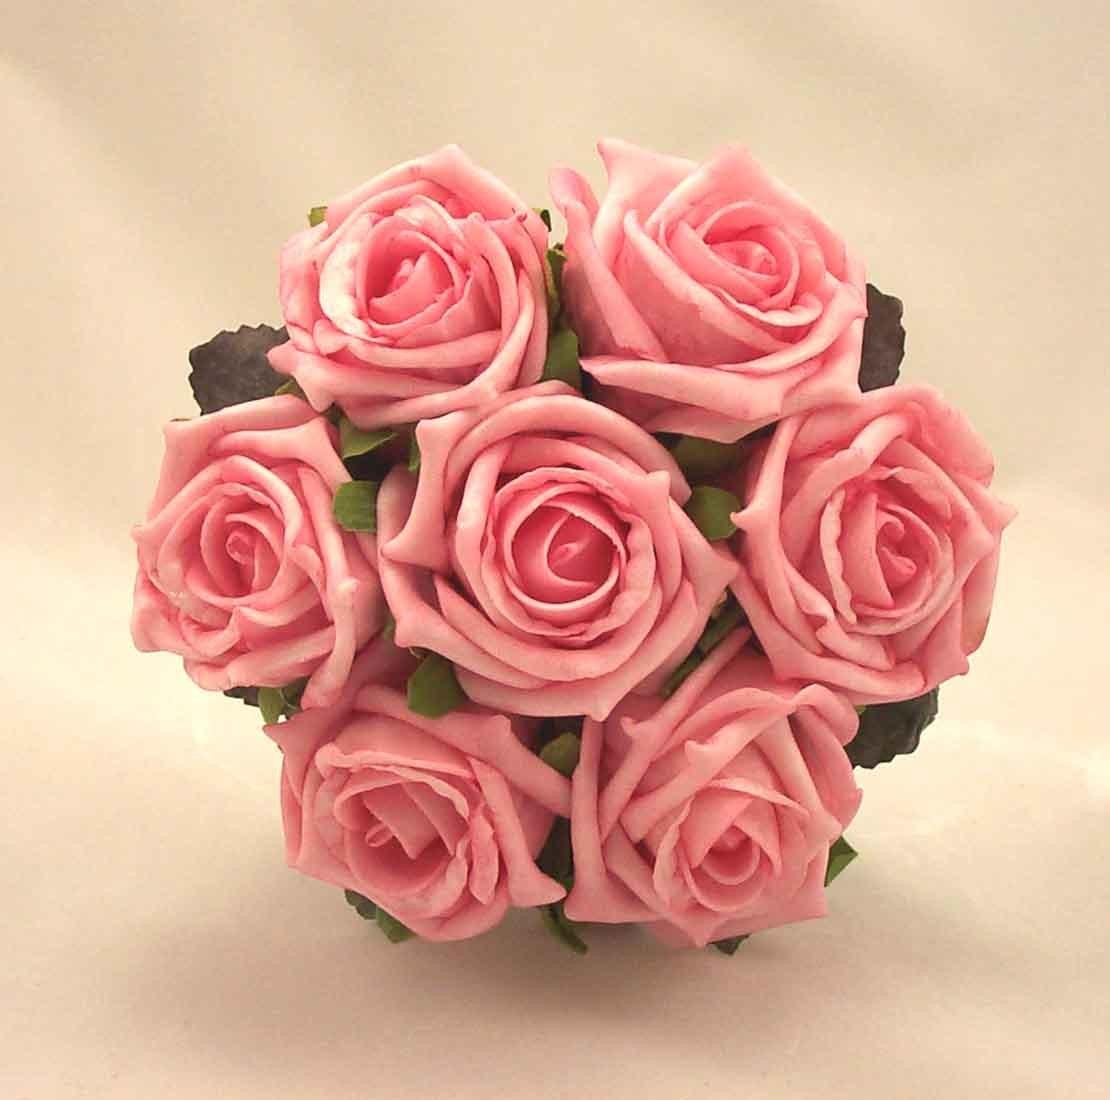 Pink Rose Children's Posy Bouquet